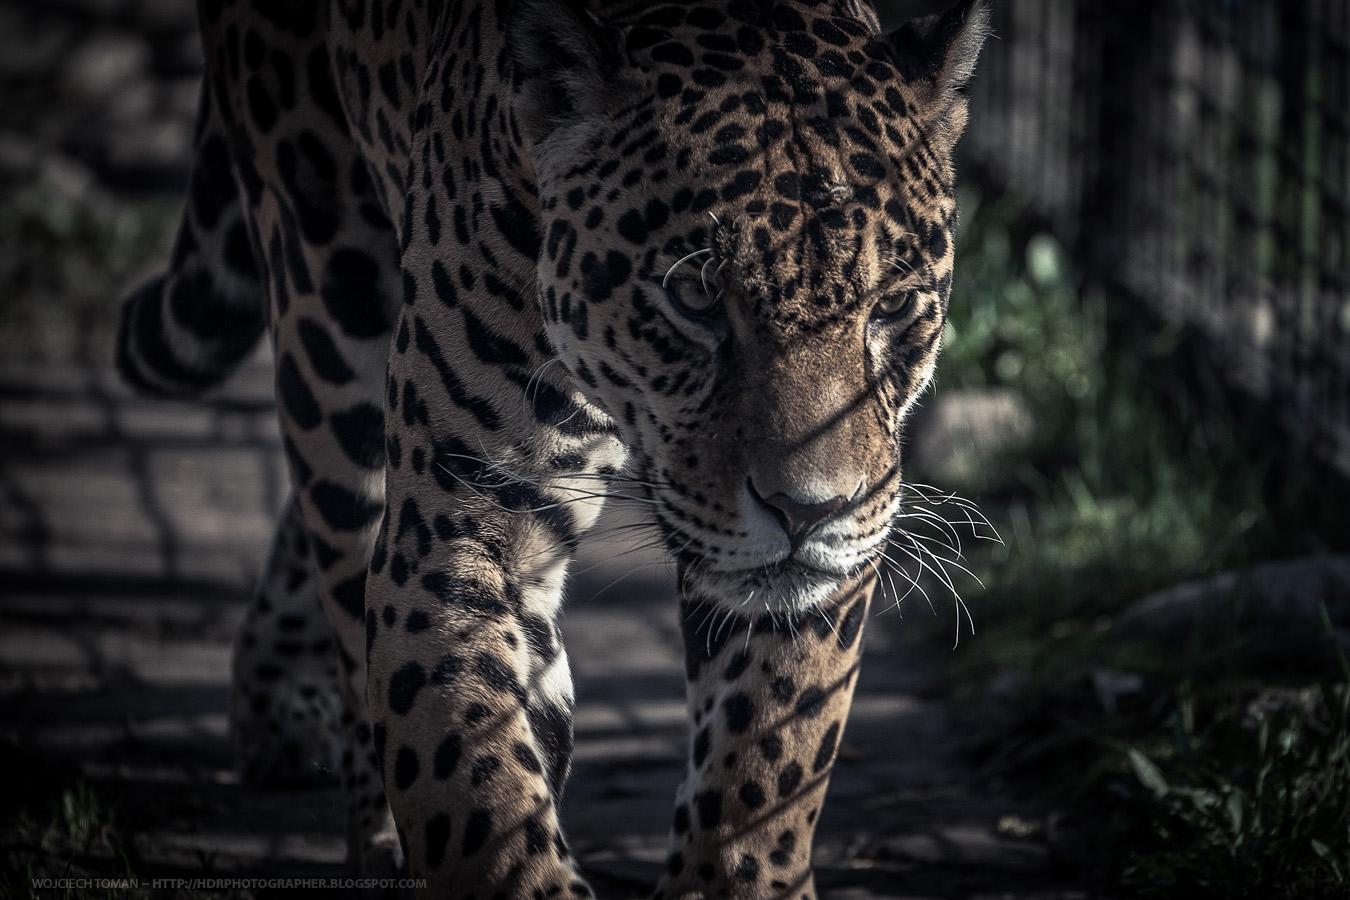 Jaguar in Warsaw zoo